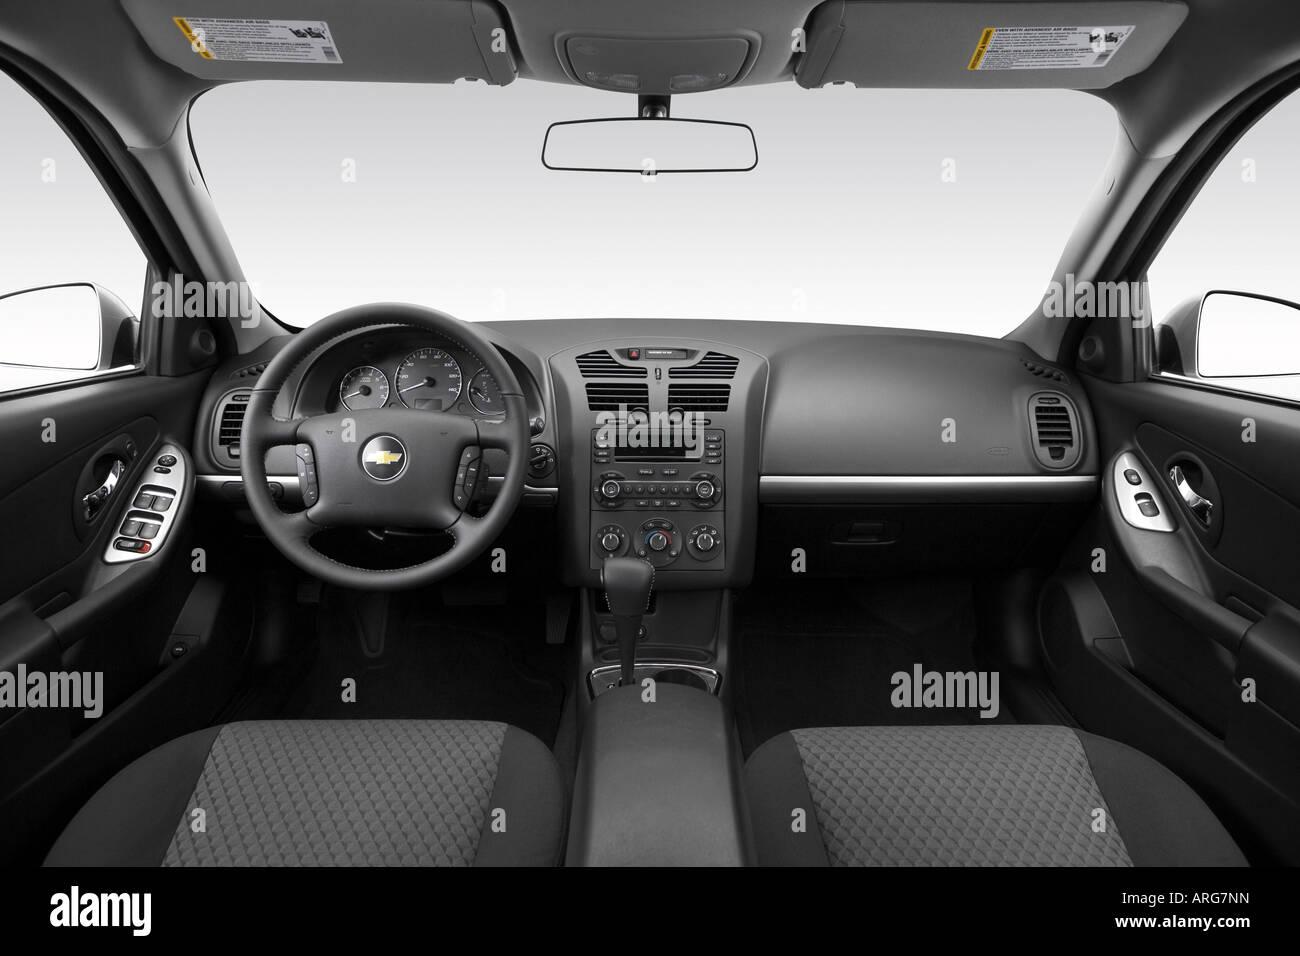 2007 Chevrolet Malibu Maxx LT in Silver - Dashboard, center ...